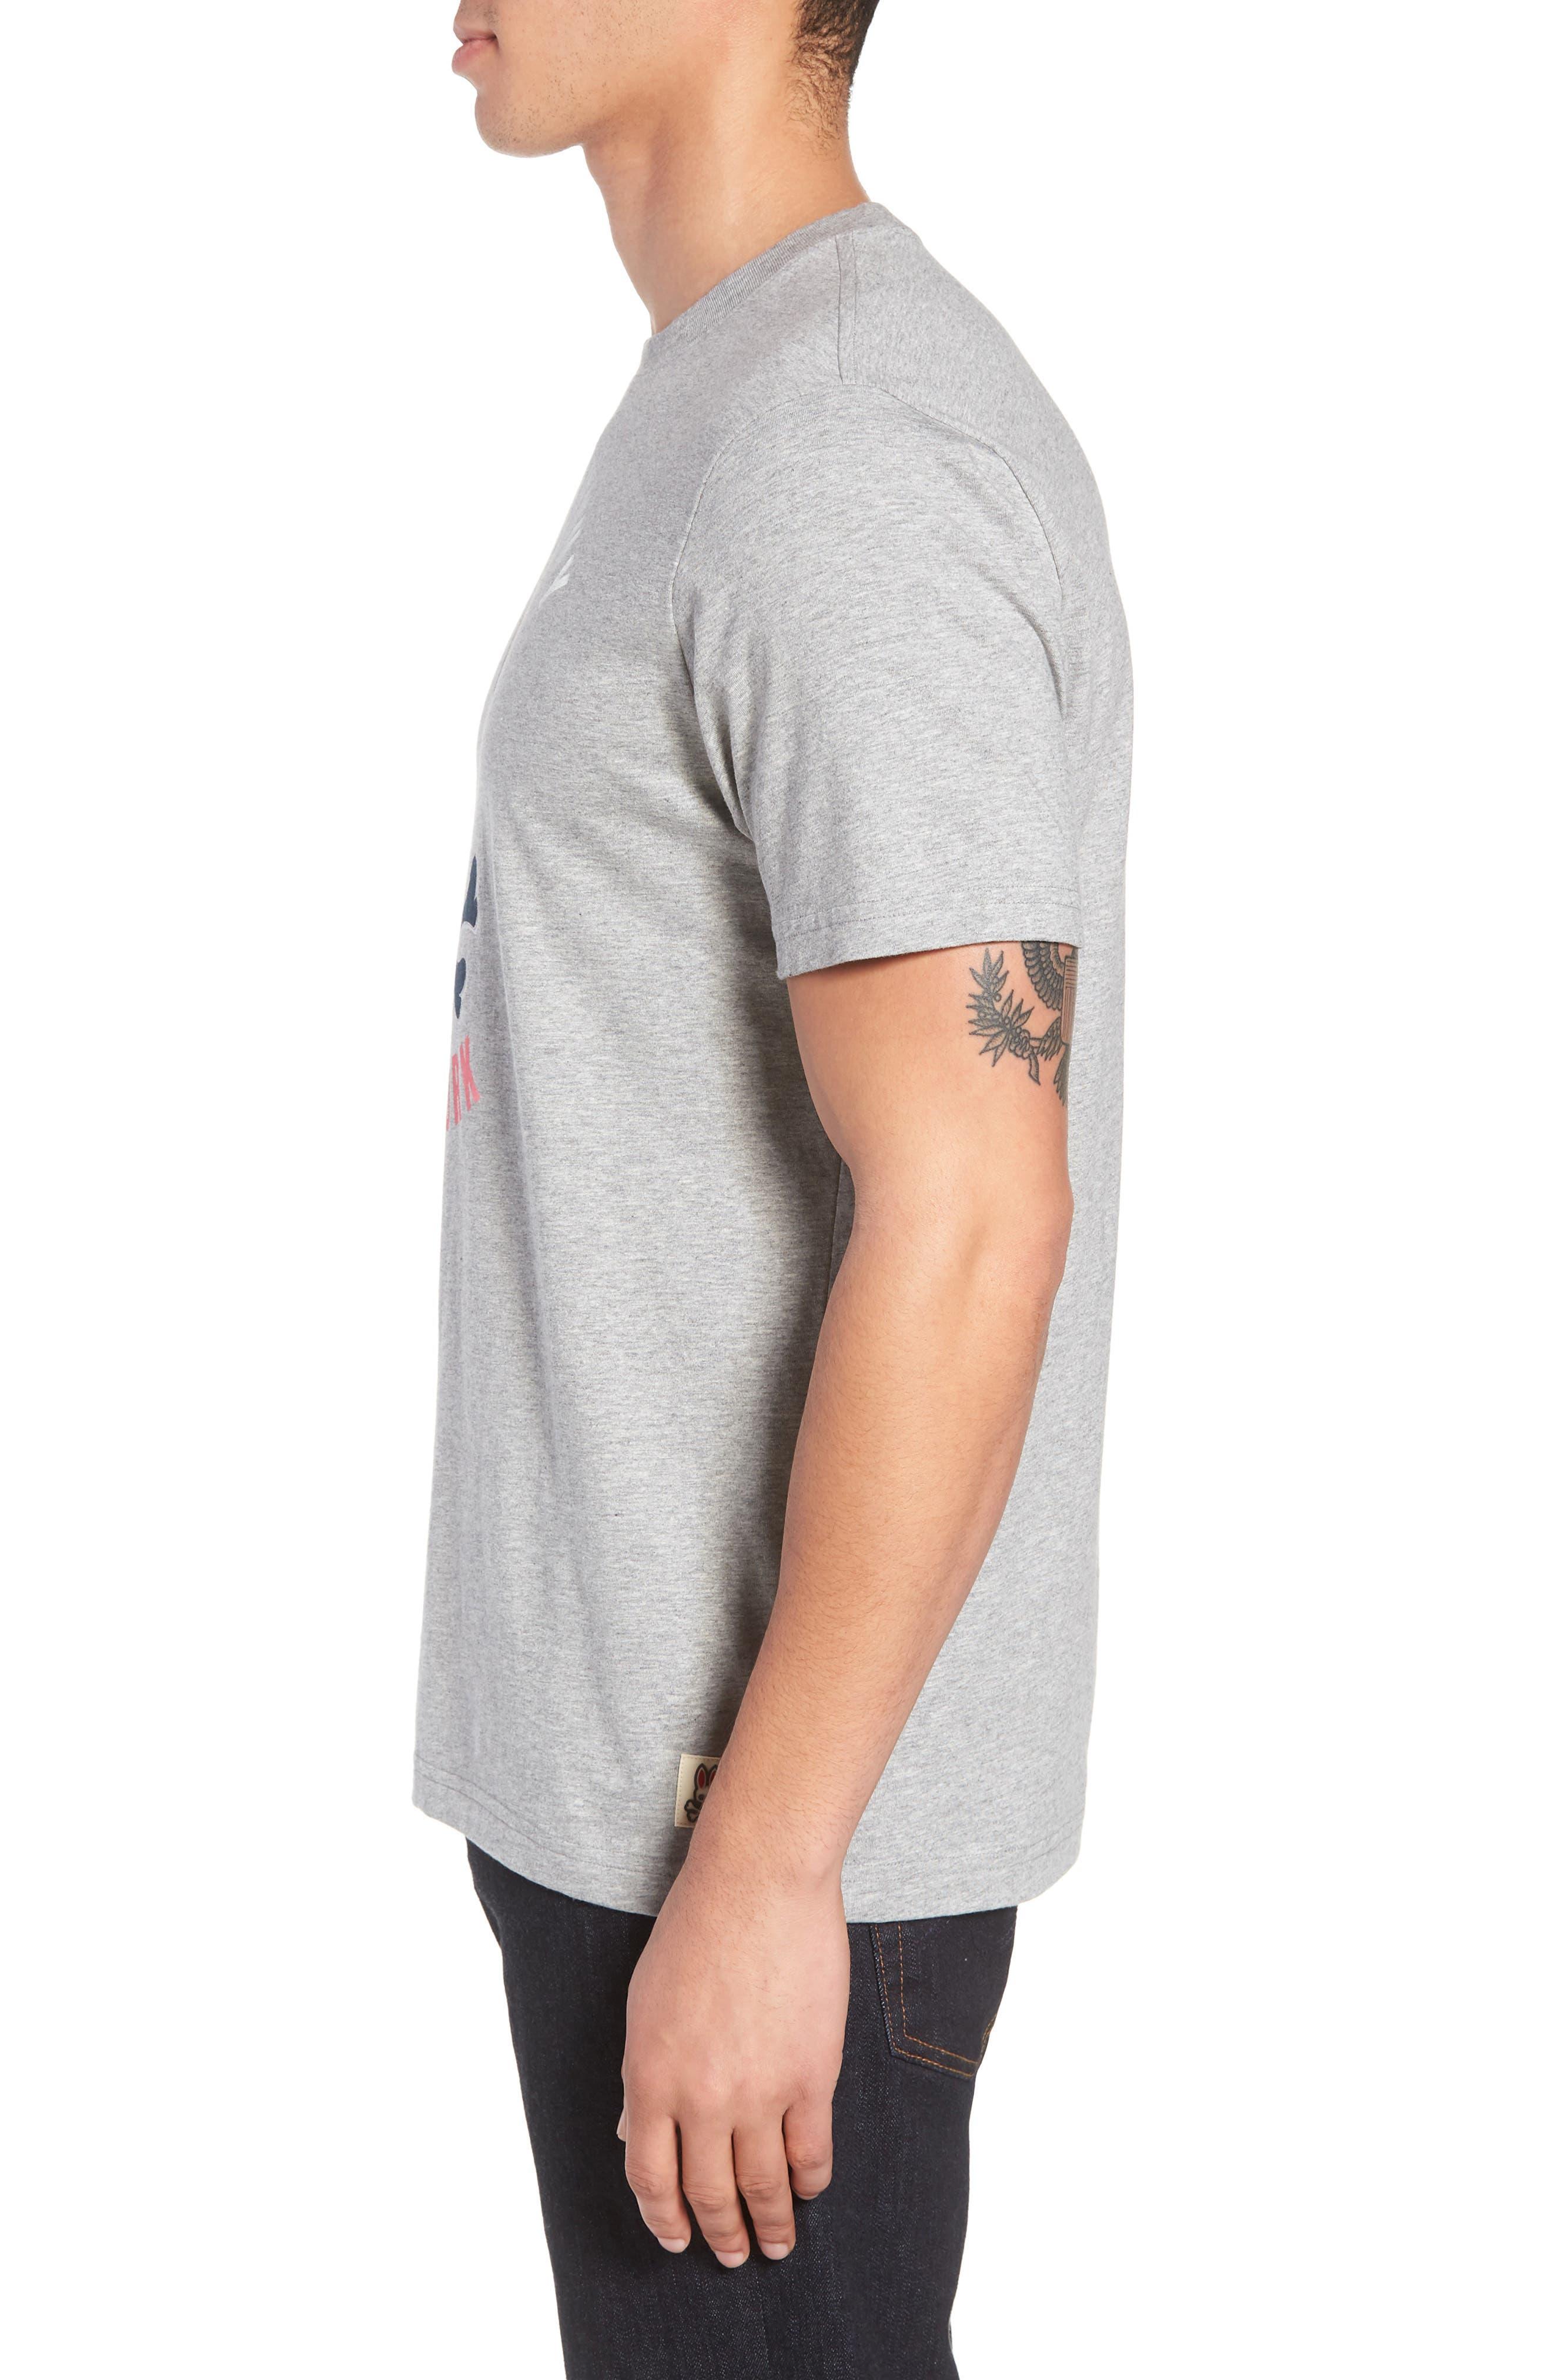 PSYCHO BUNNY,                             Print T-Shirt,                             Alternate thumbnail 3, color,                             063